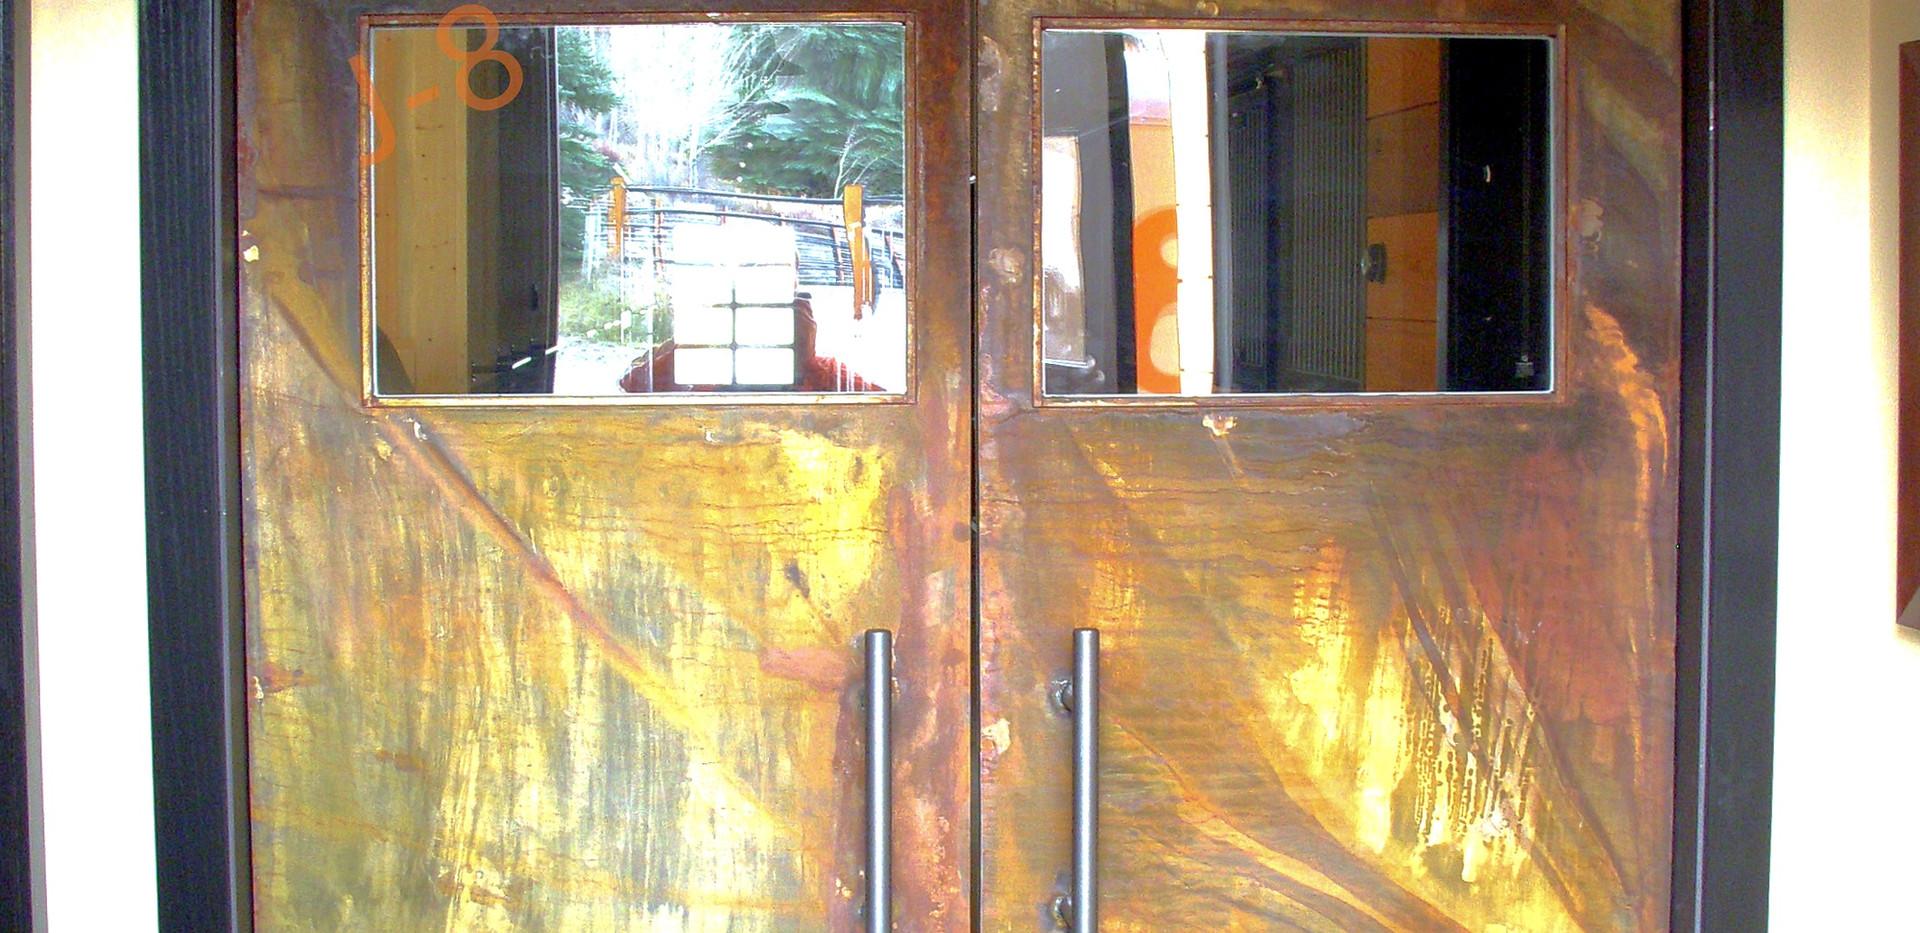 Dual Pivoting Doors